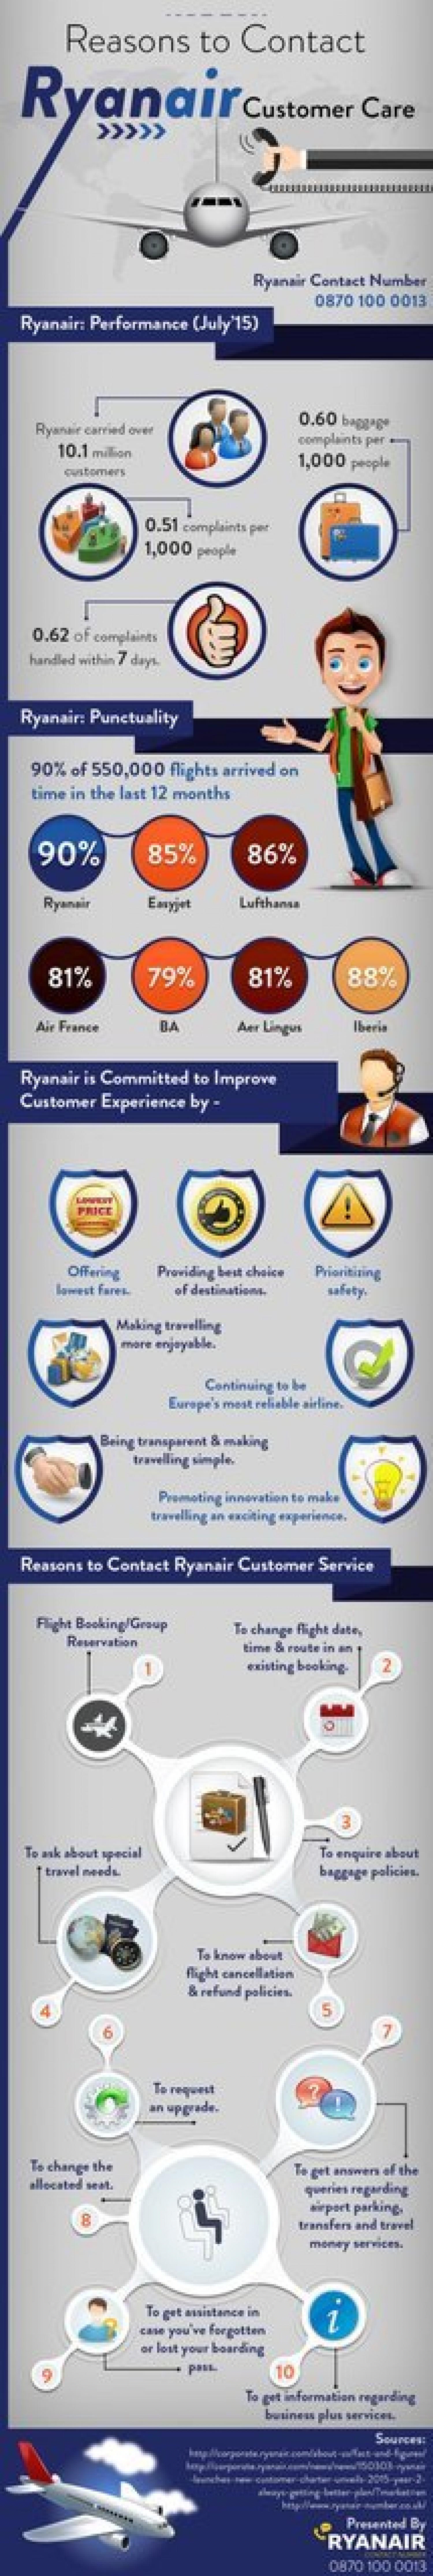 Reasons to Contact Ryanair Customer Care | Visual.ly